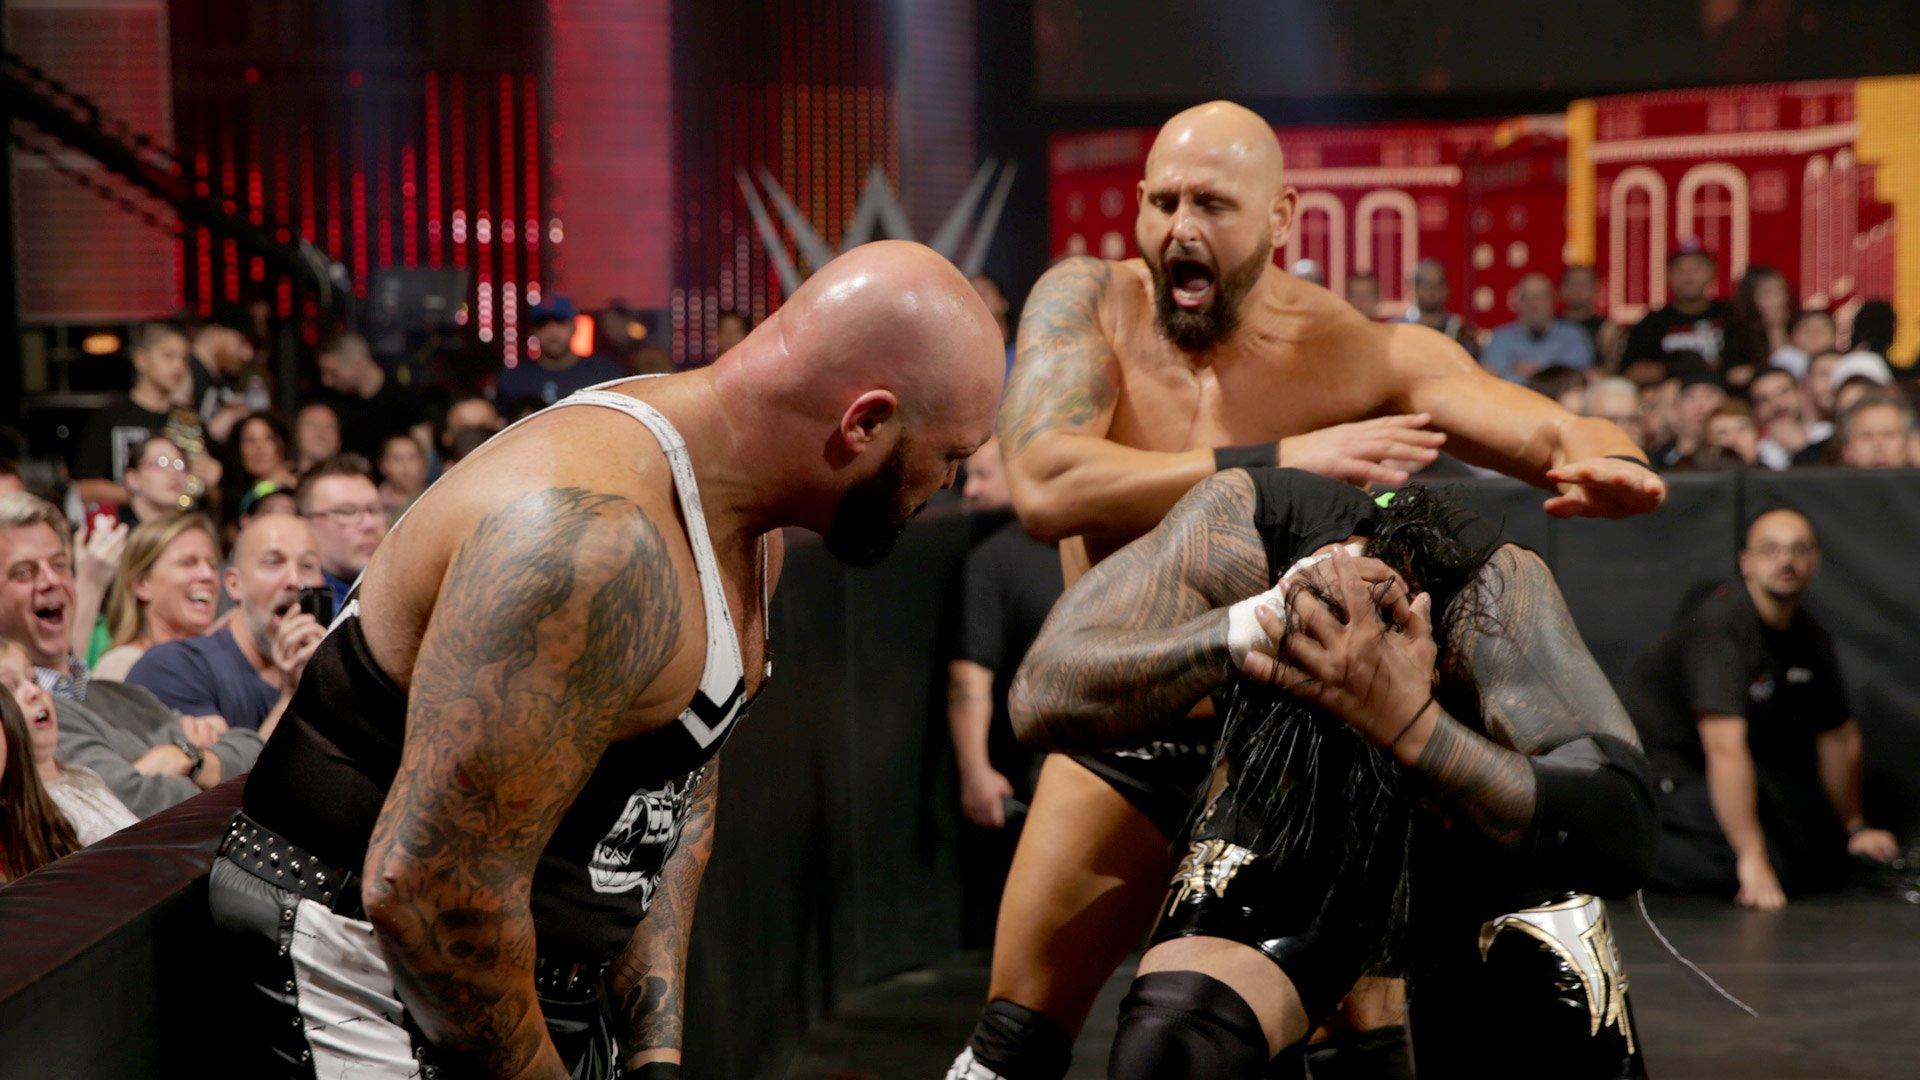 Wwe world heavyweight champion roman reigns def aj styles extreme rules match wwe